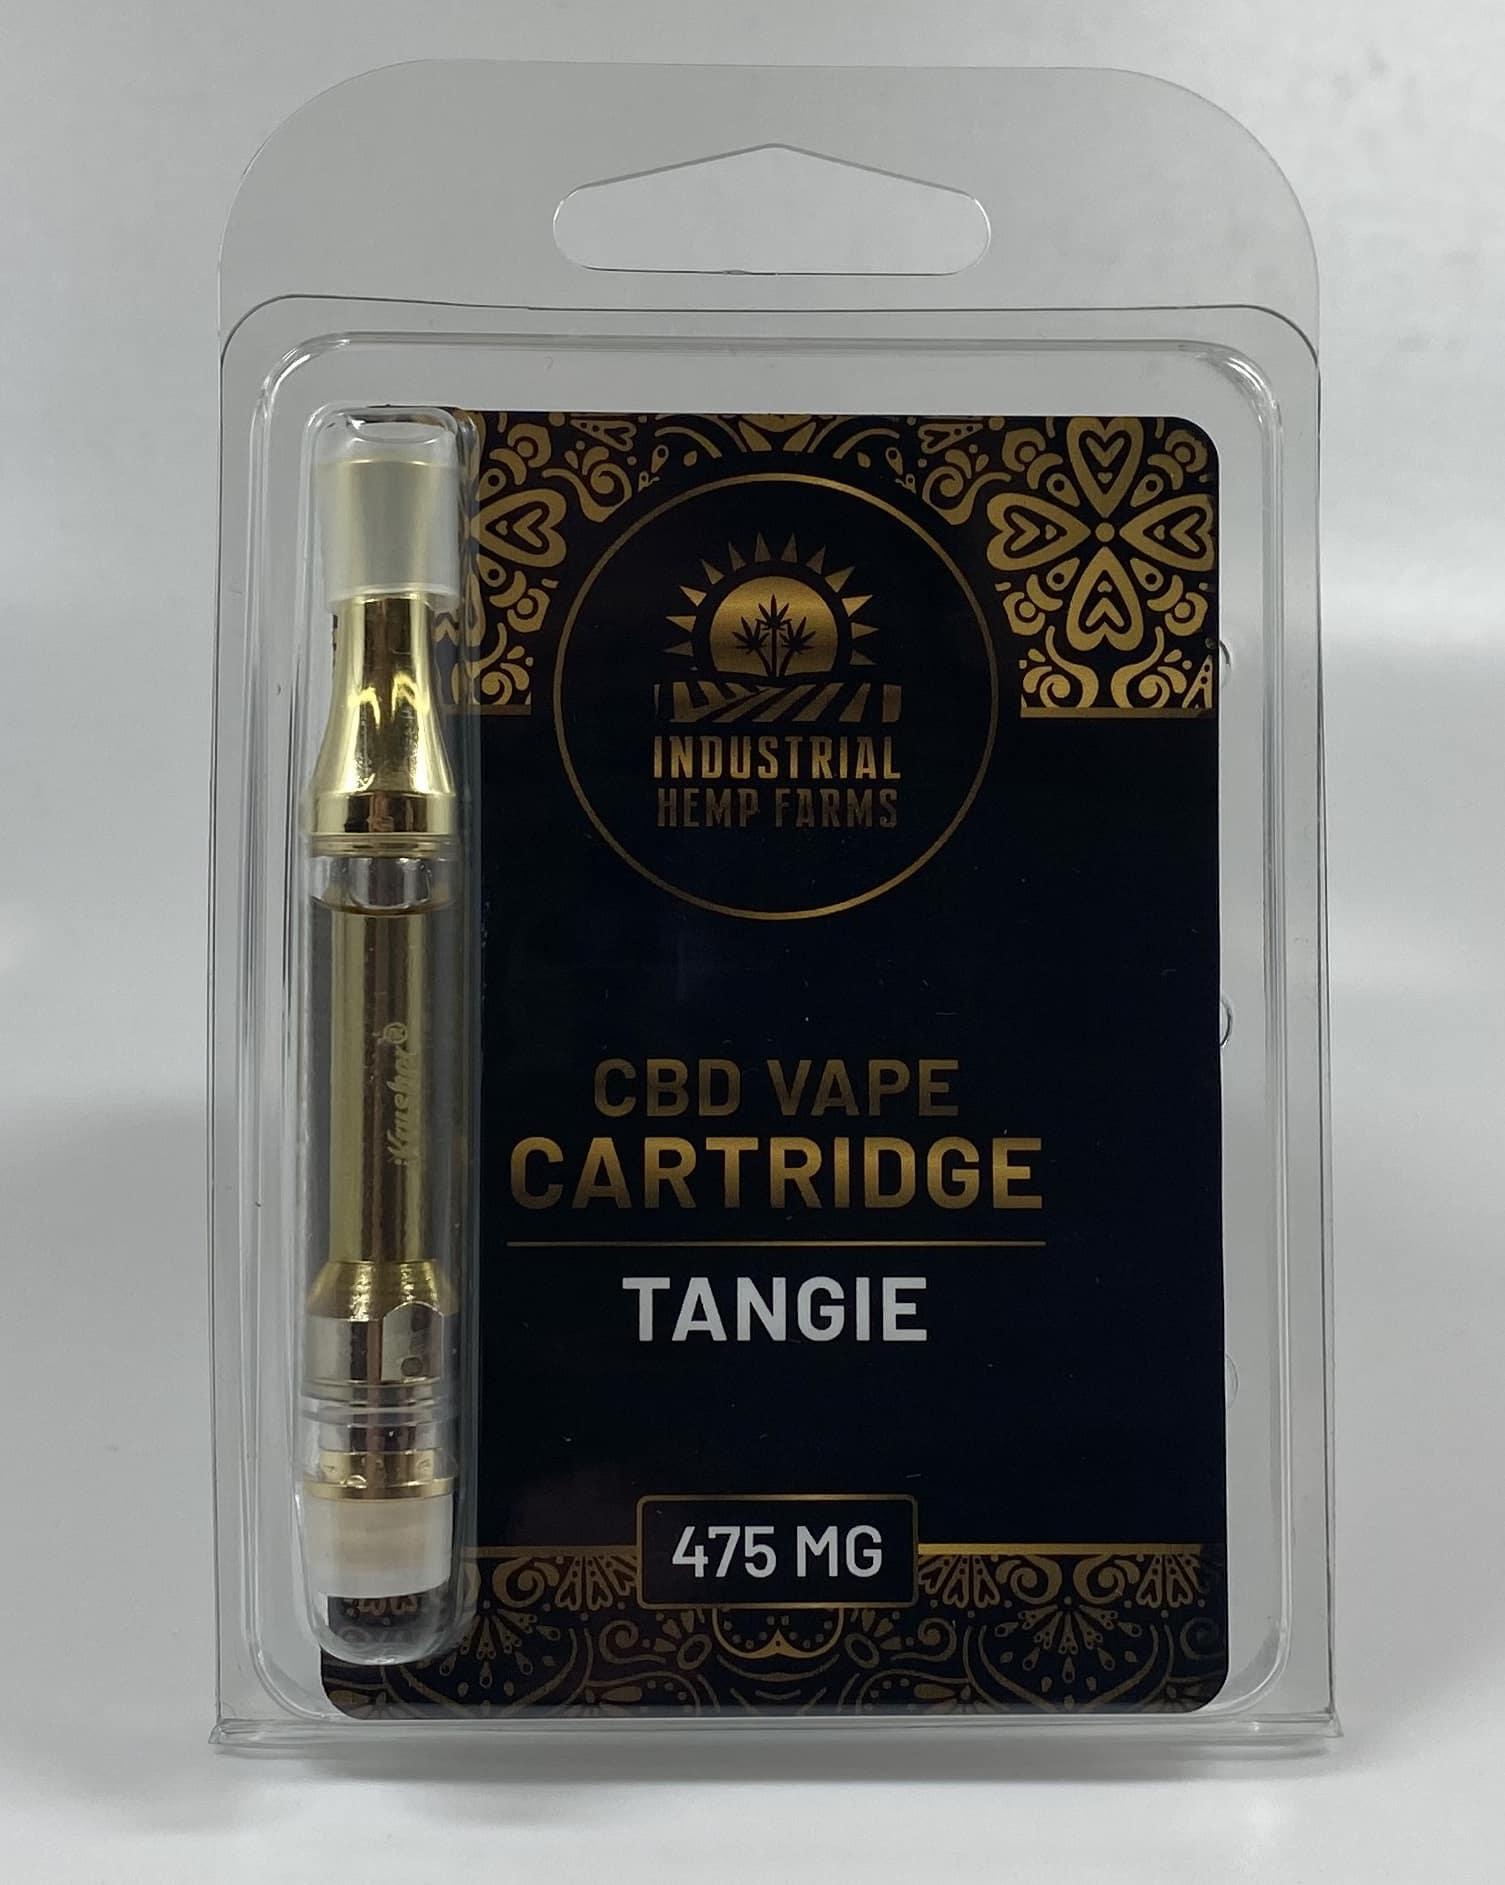 tangie vape cartridge for sale